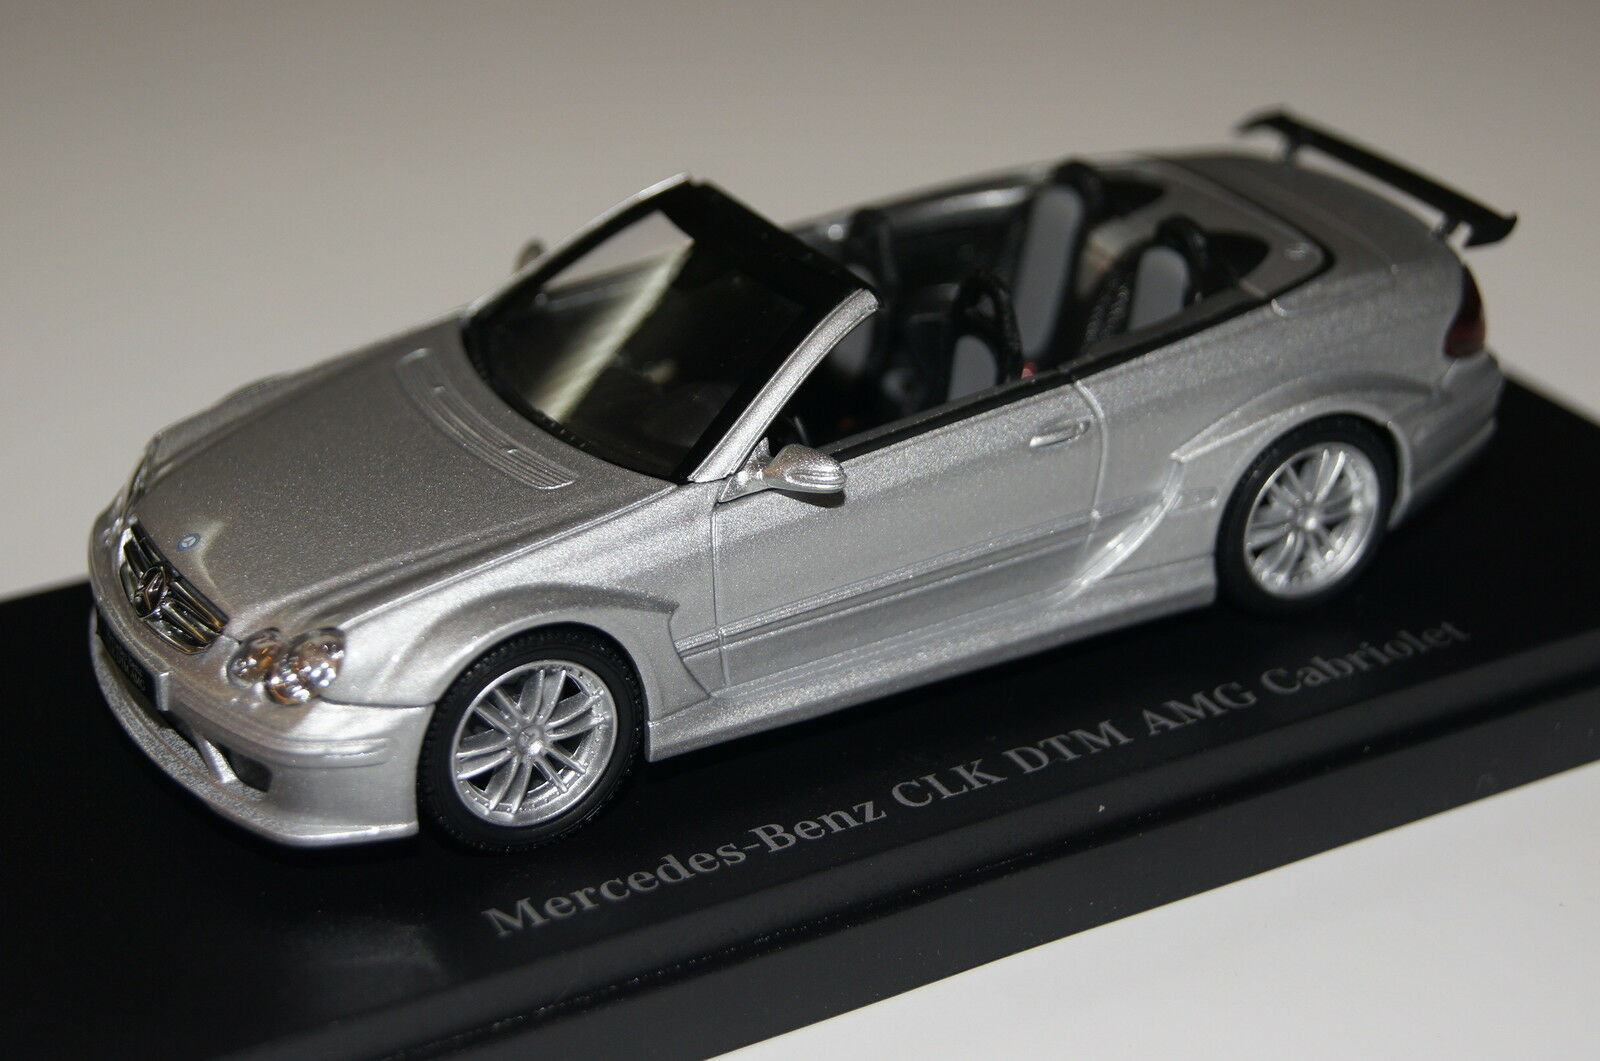 Mercedes CLK DTM AMG converdeible Street versión plata 1 43 43 43 Kyosho & OVP 3219s 0f1414